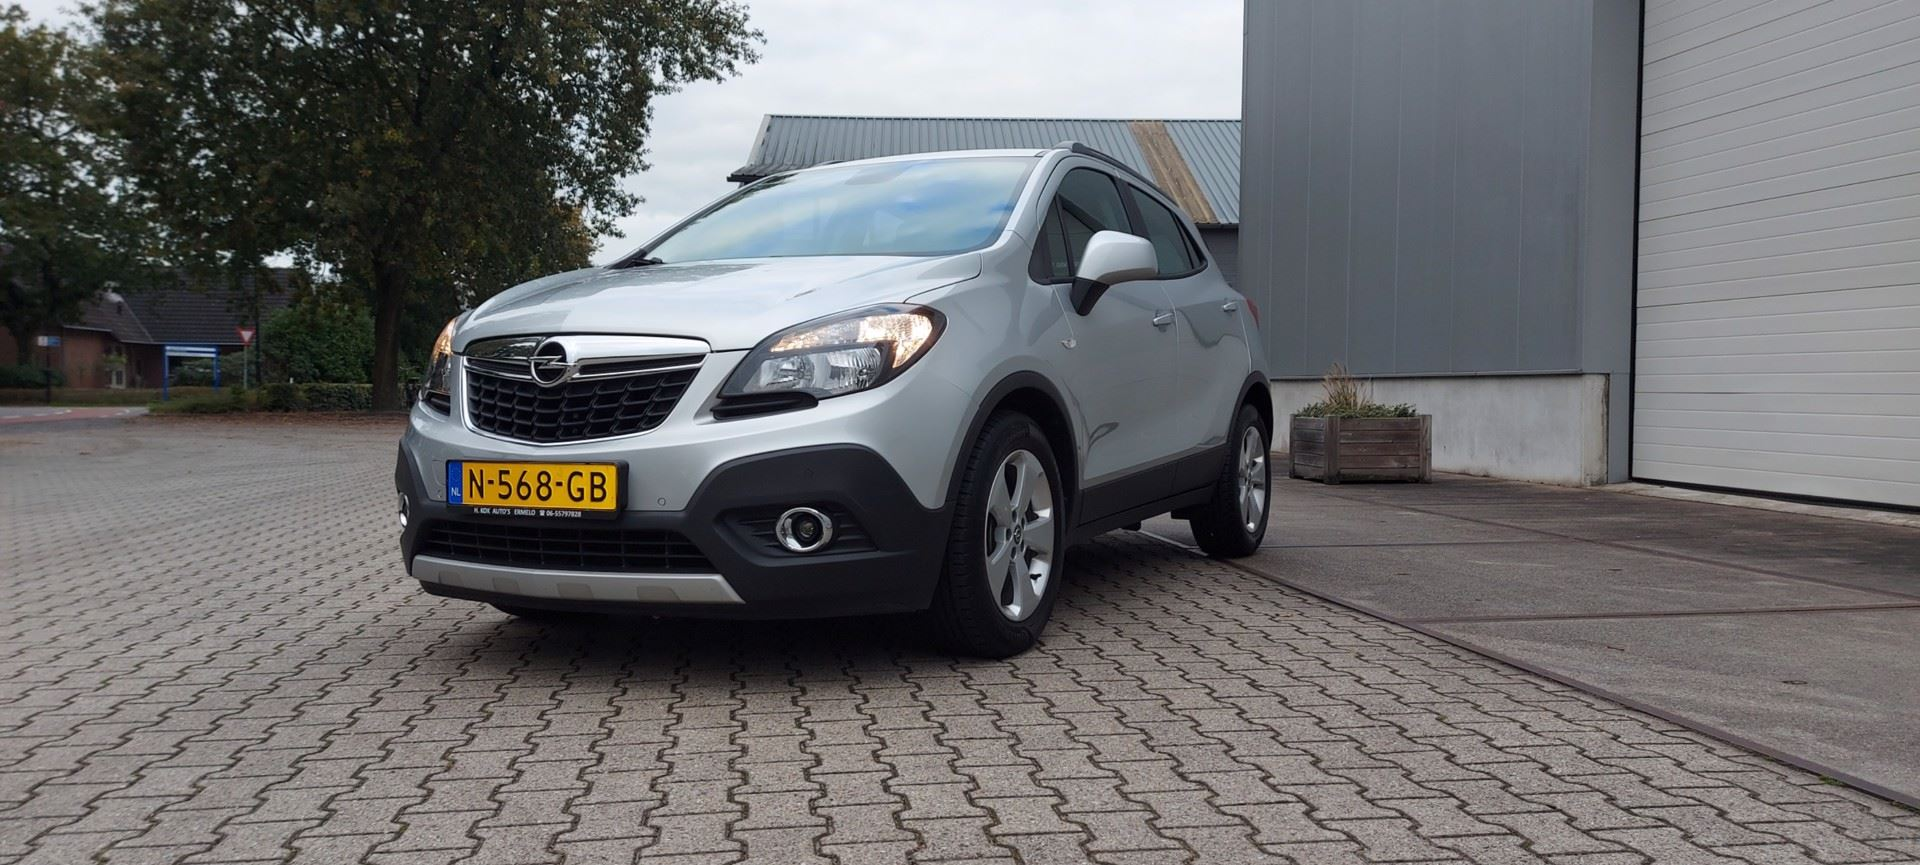 Opel Mokka occasion - H. Kok Auto's